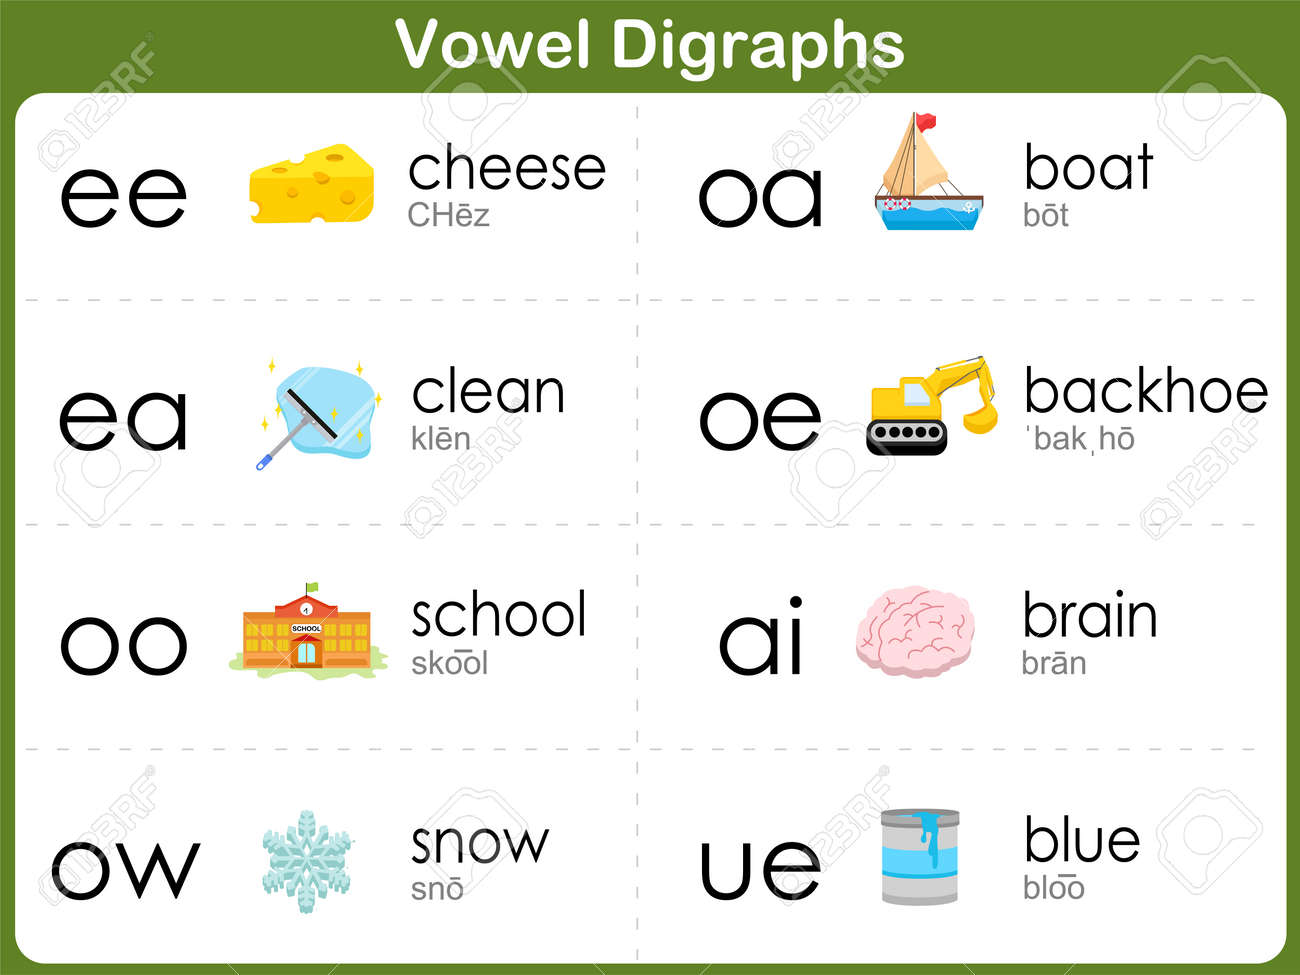 Vowel Digraphs Worksheet For Kids Royalty Free Cliparts, Vectors ...